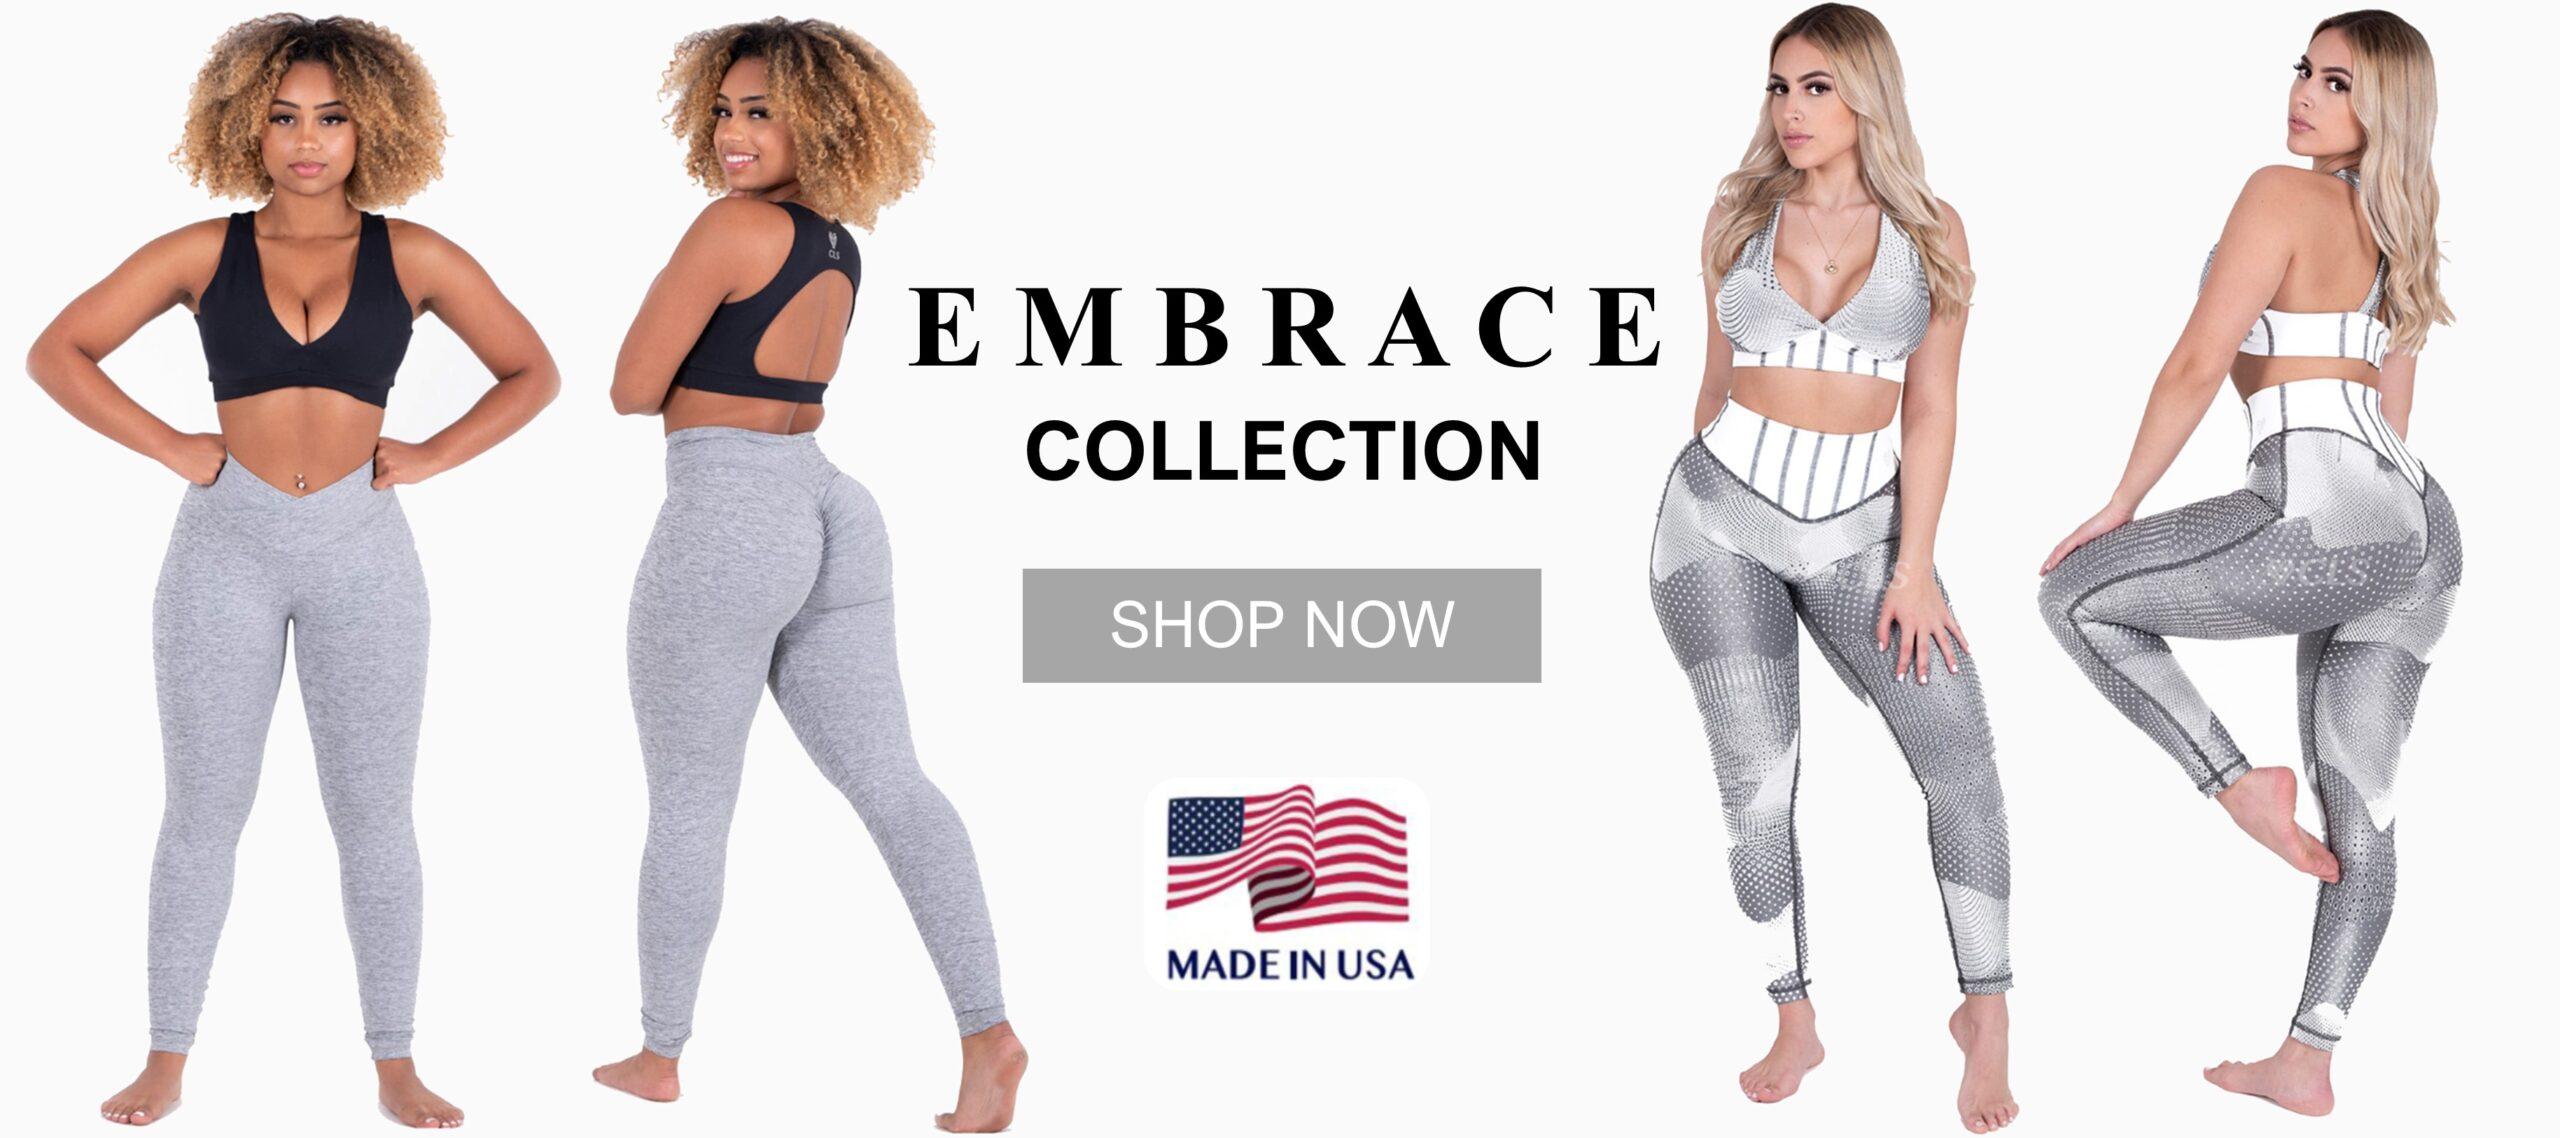 https://www.clssportswear.com/wp-content/uploads/2021/01/Announce_Slider_EmbraceCollection_Rosie1-scaled.jpg